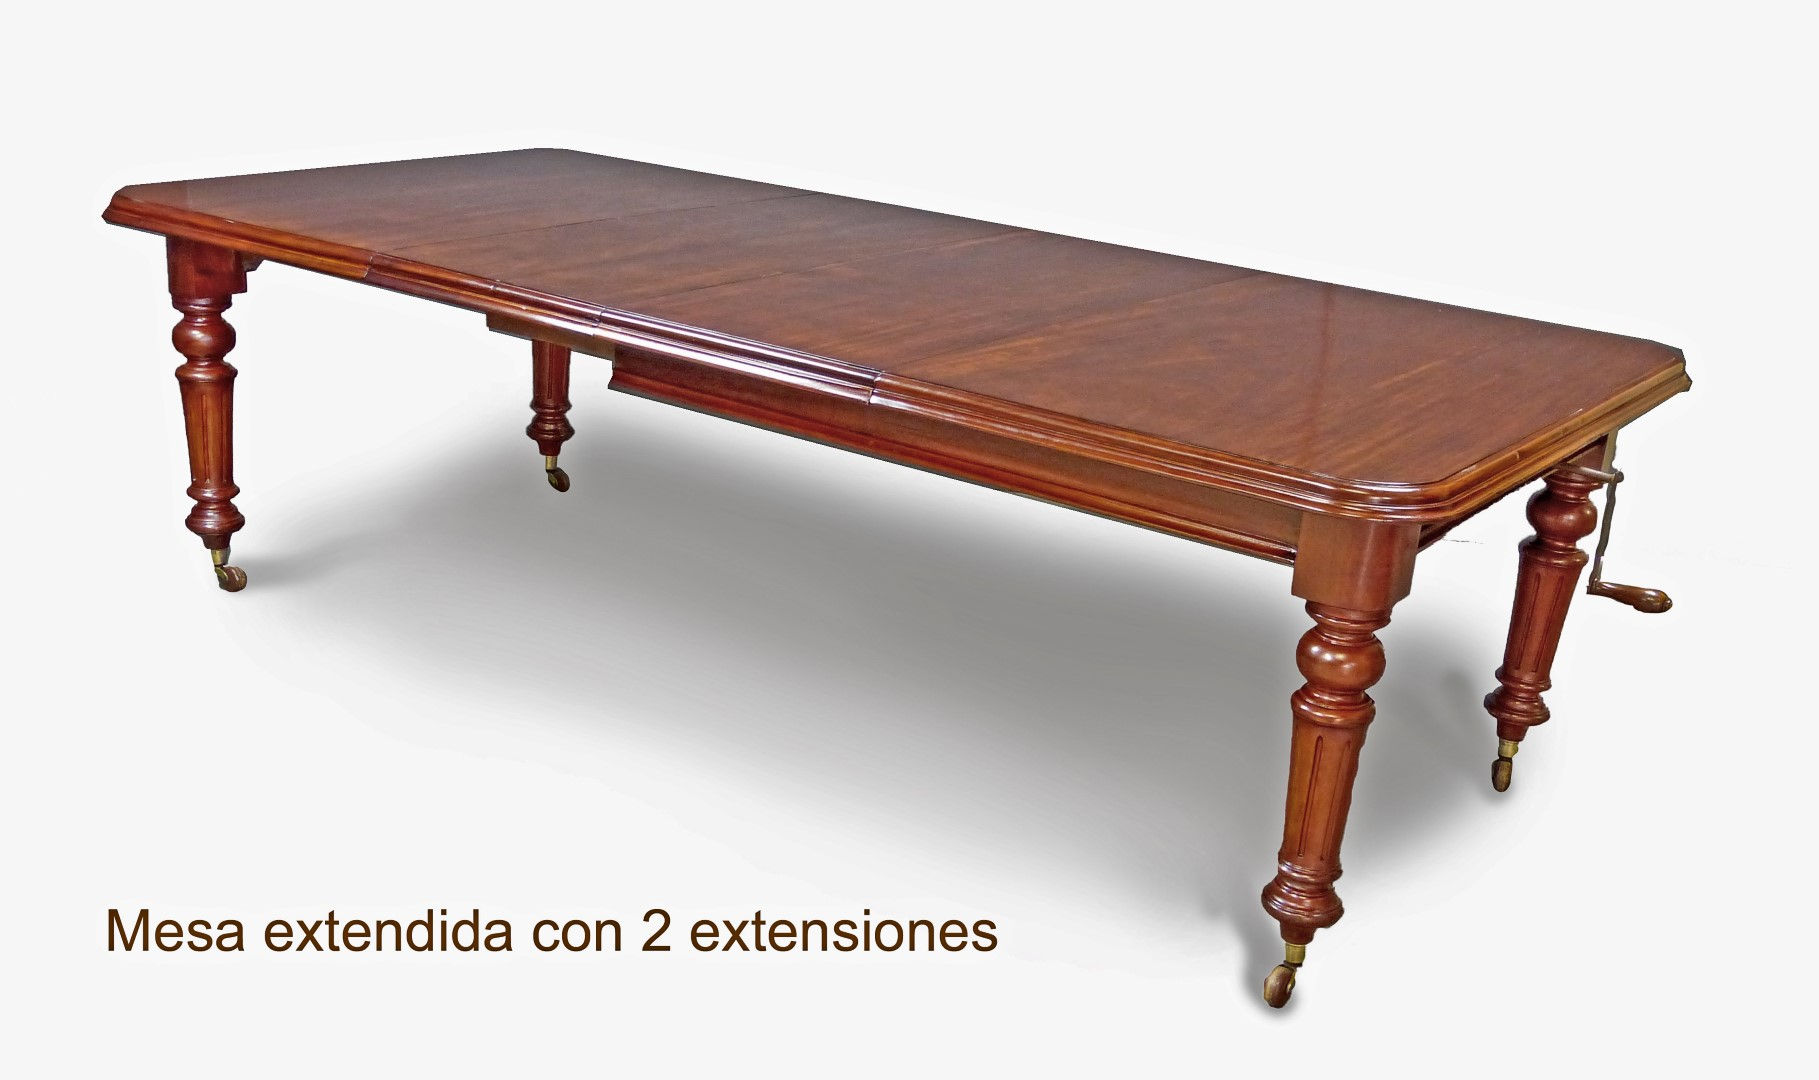 mesas de comedor mesas de comedor mesa de comedor antigua inglesa ...